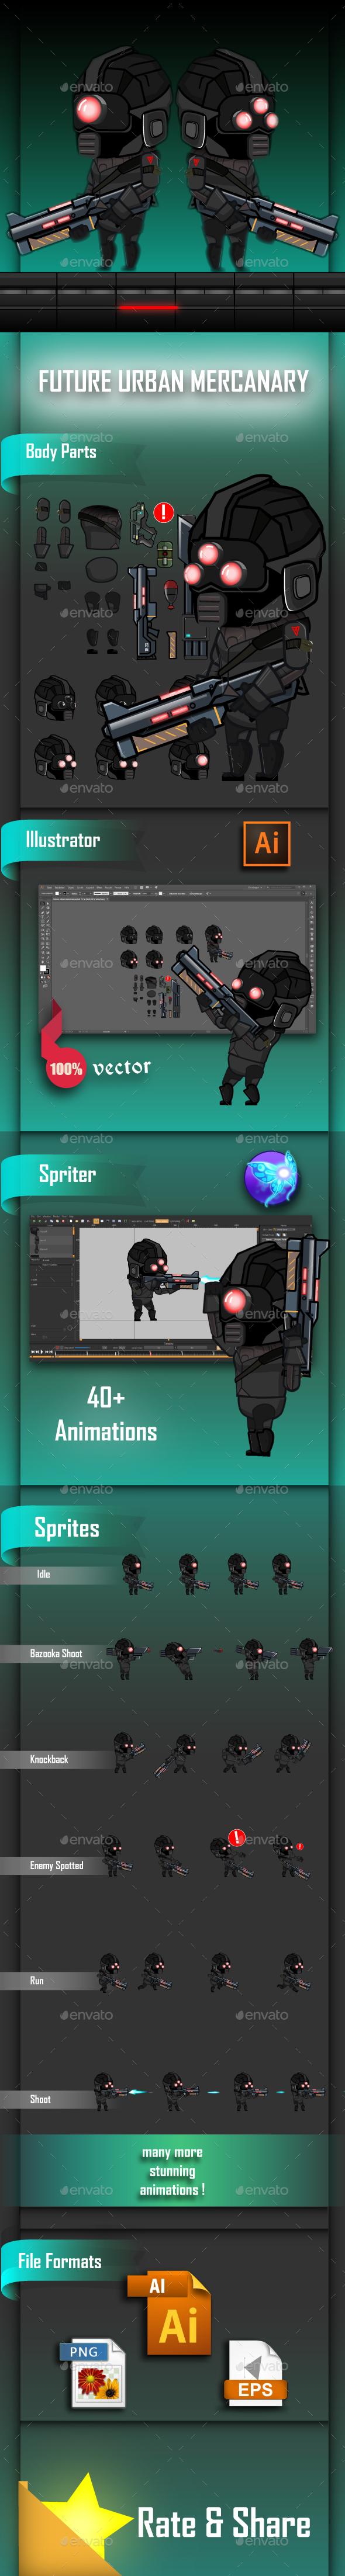 Future Urban Mercenary Game Character Sprites - Sprites Game Assets